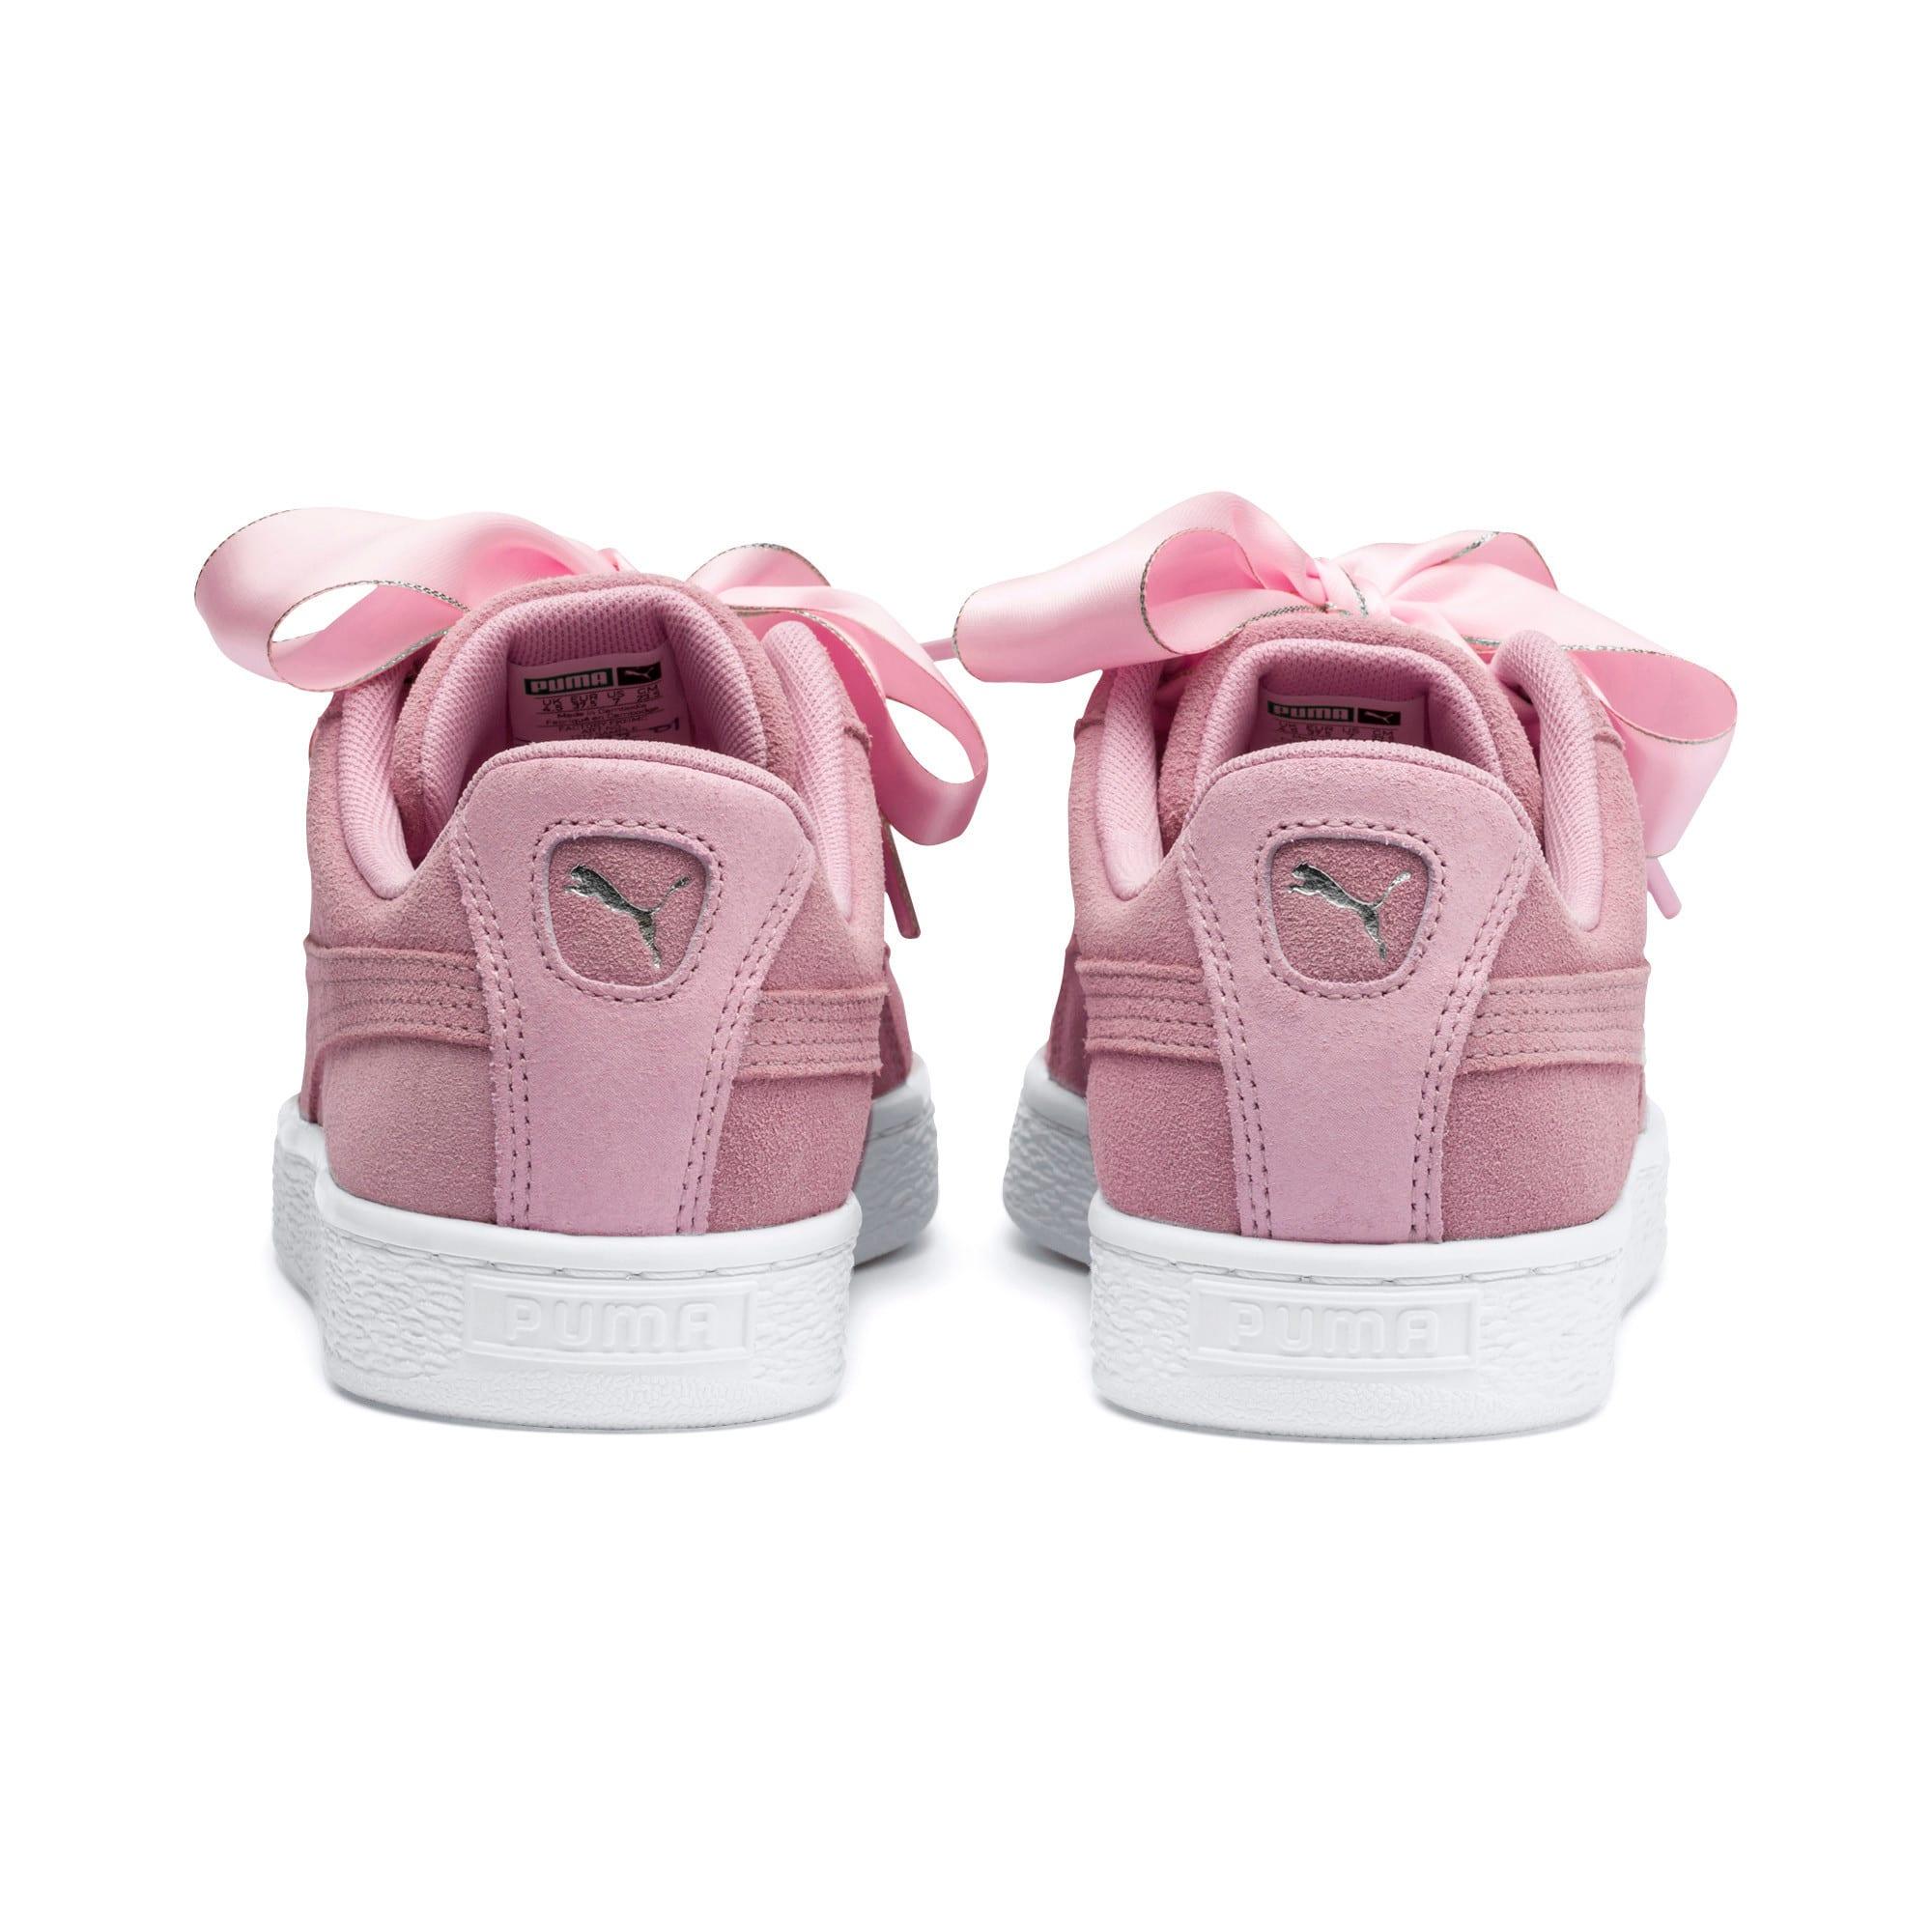 innovative design 6a154 cbdd4 Suede Heart Galaxy Women's Sneakers